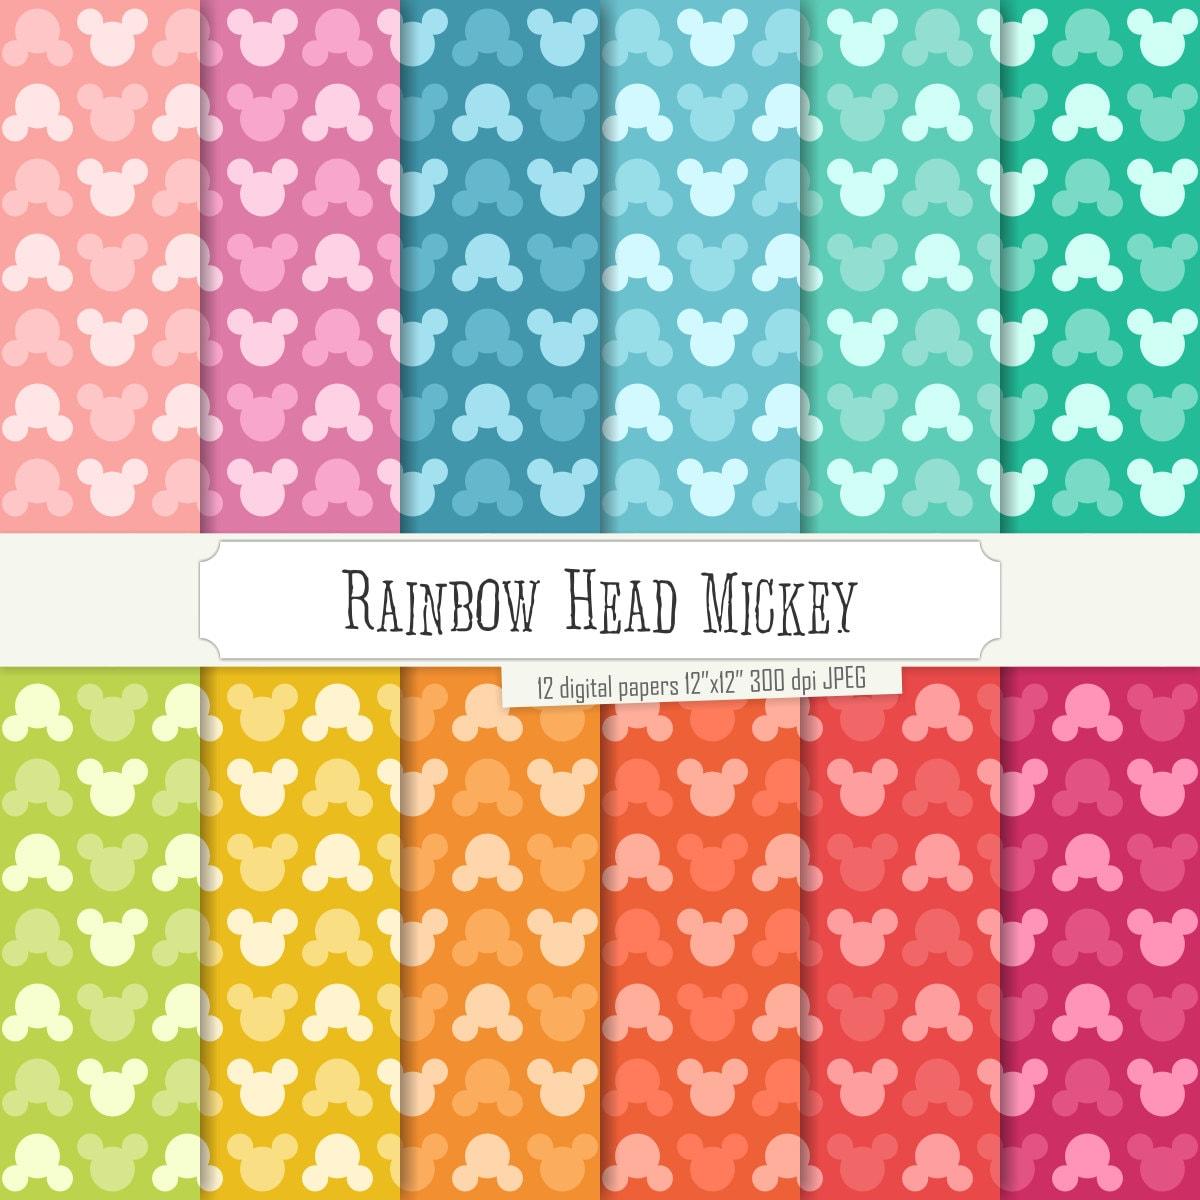 Buy 2 Get 1 Free Digital Paper Rainbow Head Mickey Pattern